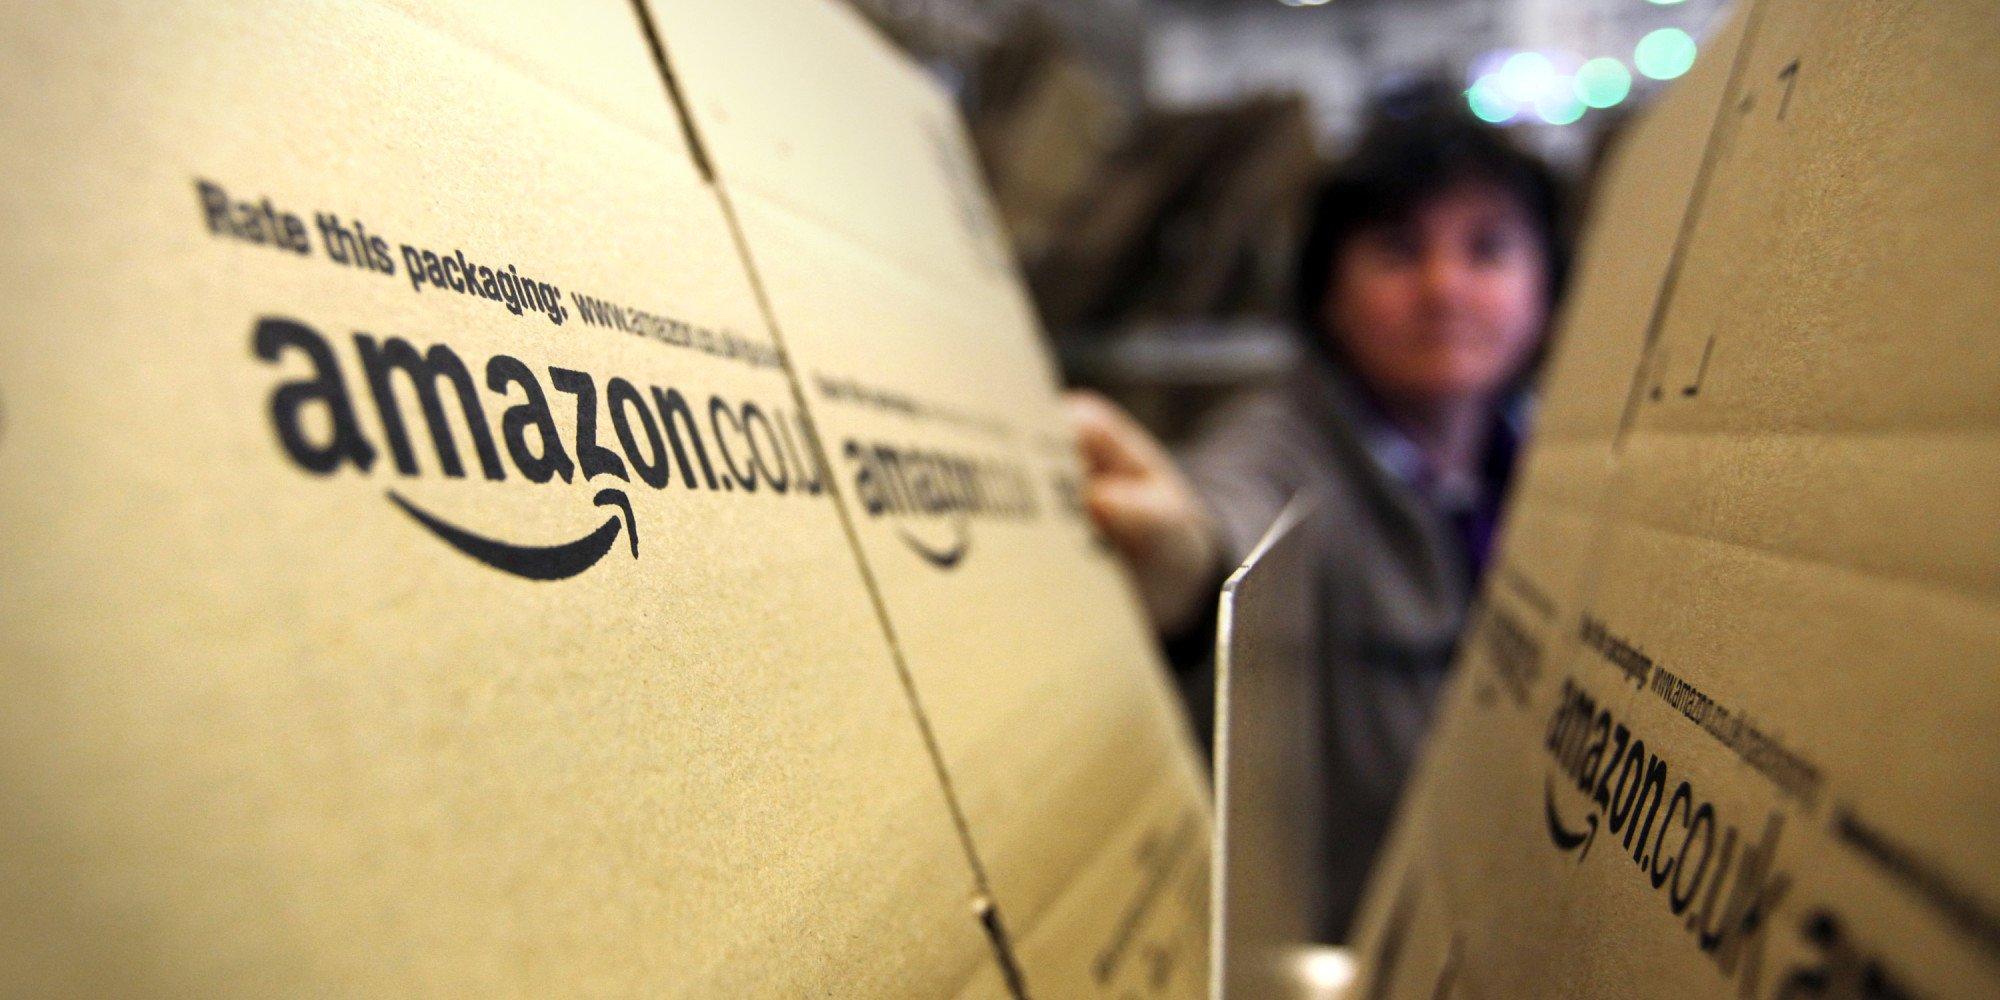 Amazon Hesaplarınız Tehlikede amazon hesaplarınız tehlikede Amazon Hesaplarınız Tehlikede s 1eacc6adee587152a6c8f82f544d03831007eb87